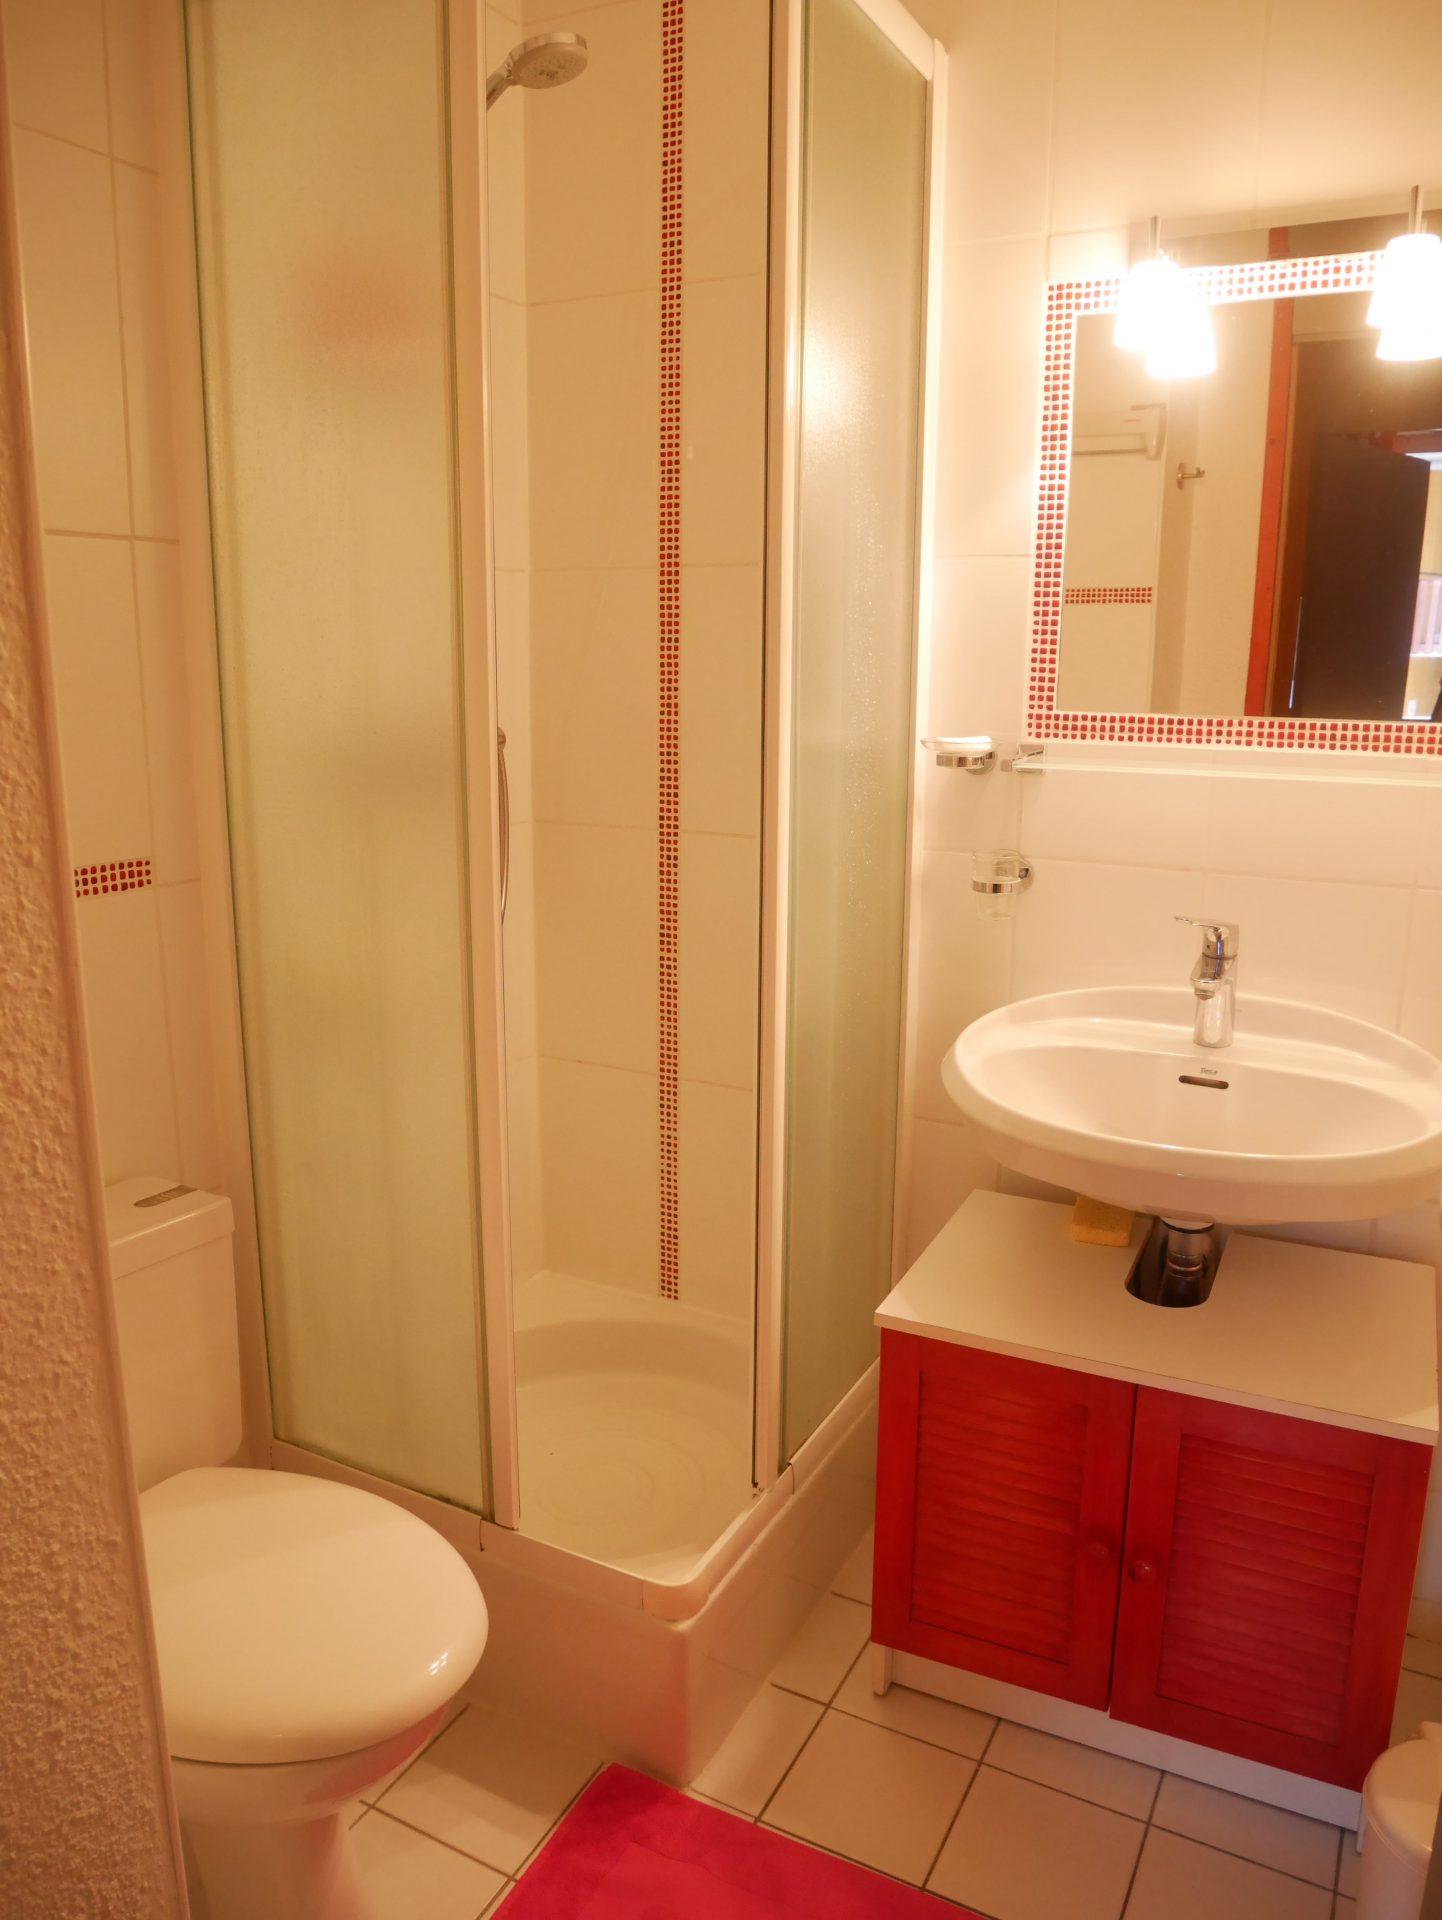 salle de bain du haut